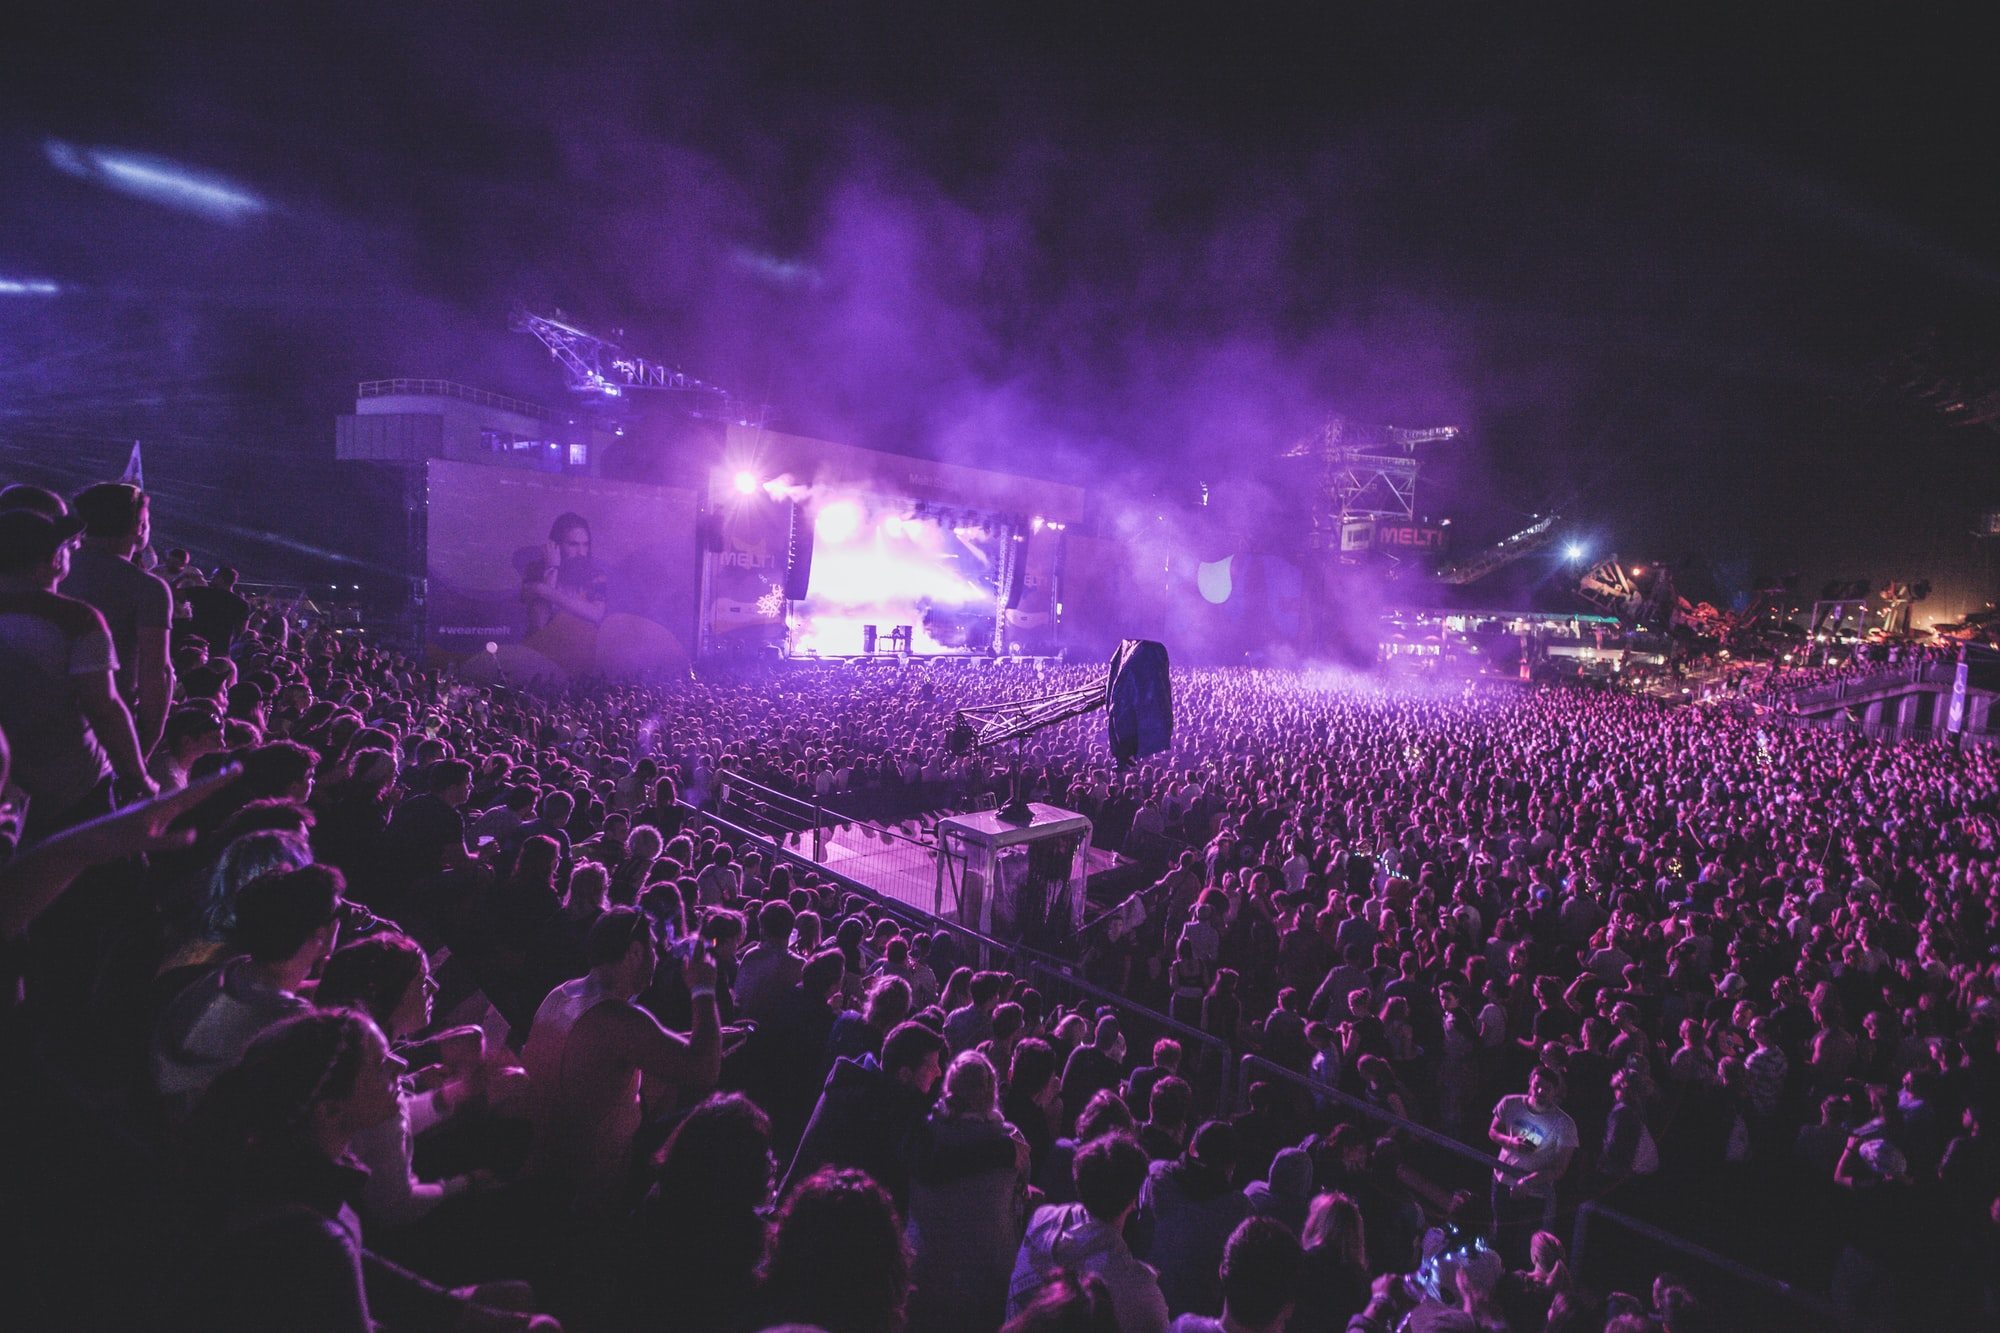 Purple lights and smoke